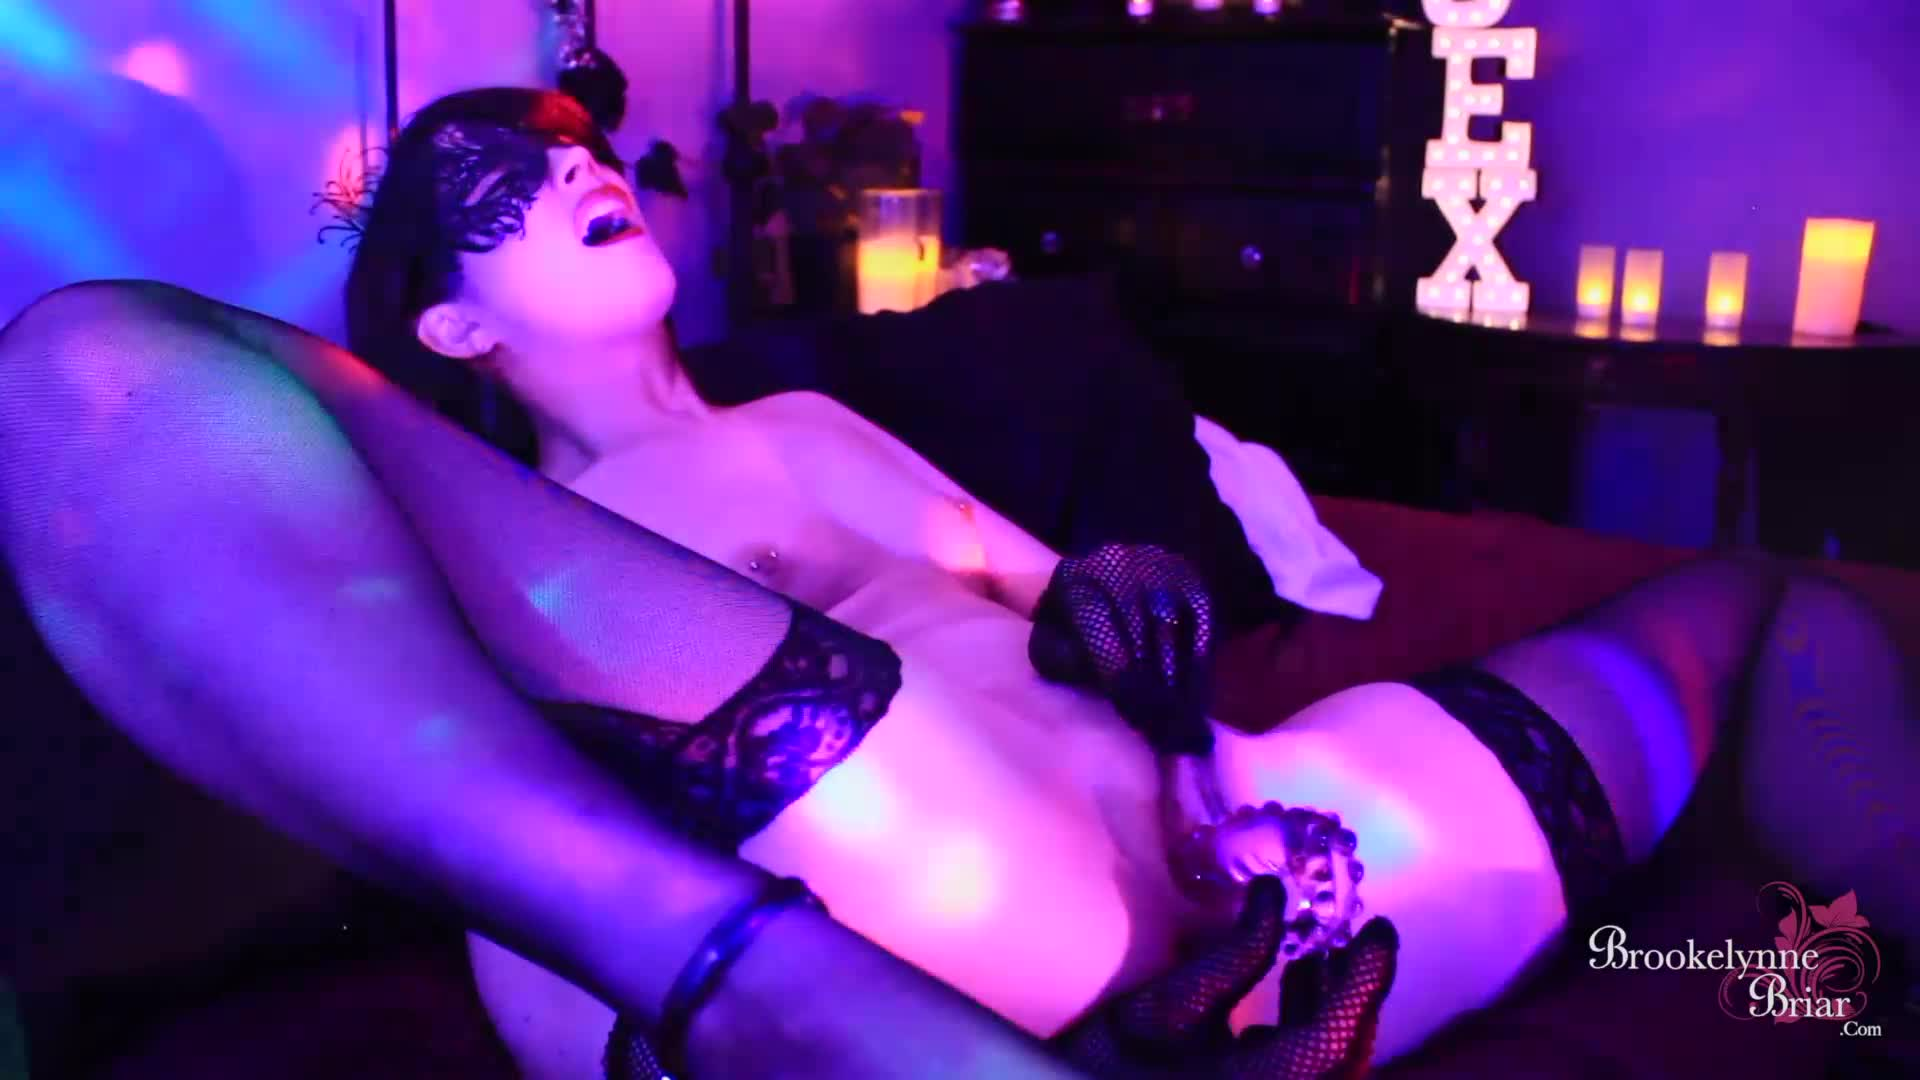 """Brookelynne Briar"" (Masturbation, Close-Ups, Mask Fetish, Glass Dildos, Dildo Fucking) Pussy Play After Dark - ManyVids Production"